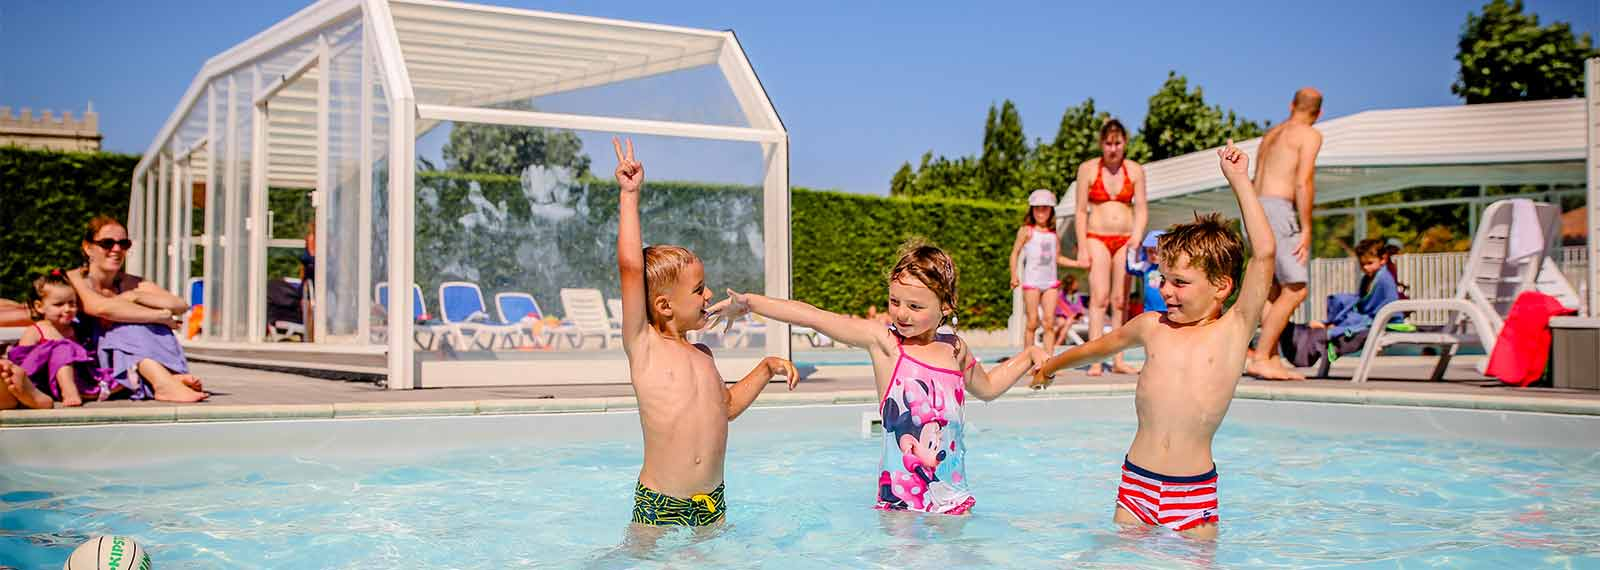 Camping ile de r avec piscine piscine couverte chauff e for Camping a paris avec piscine